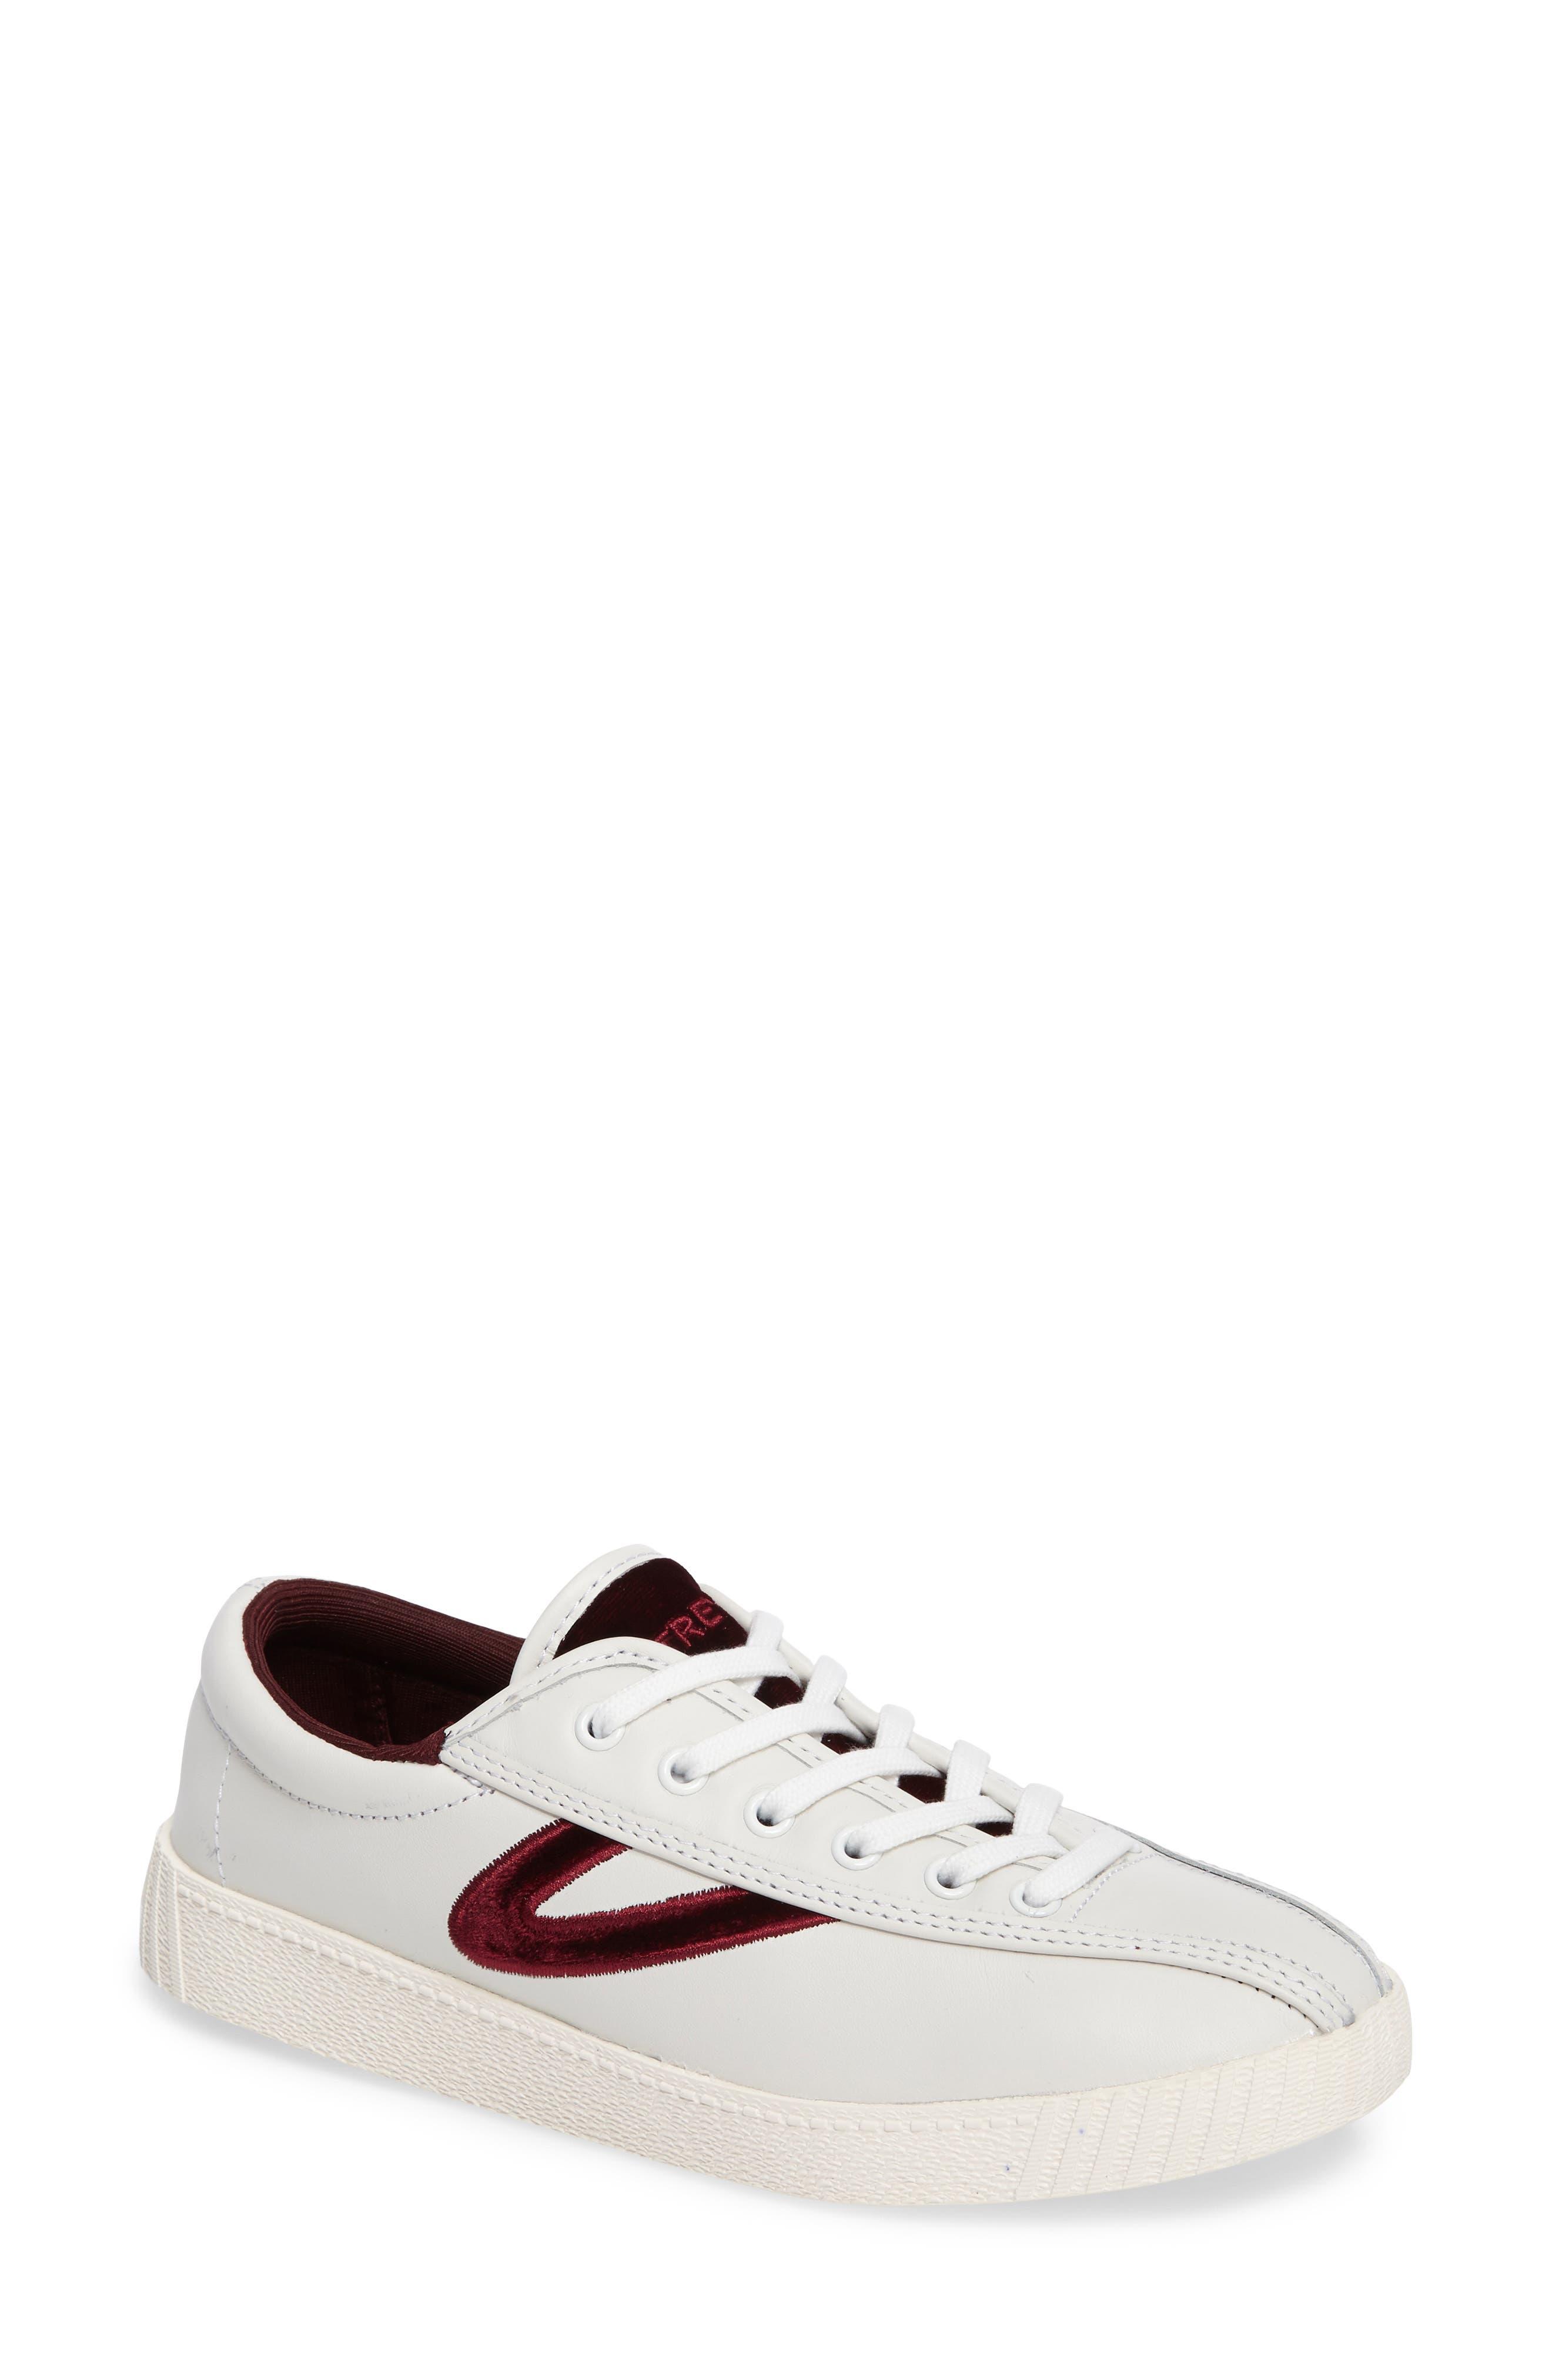 Tretorn Nylite Plus Sneaker (Women)